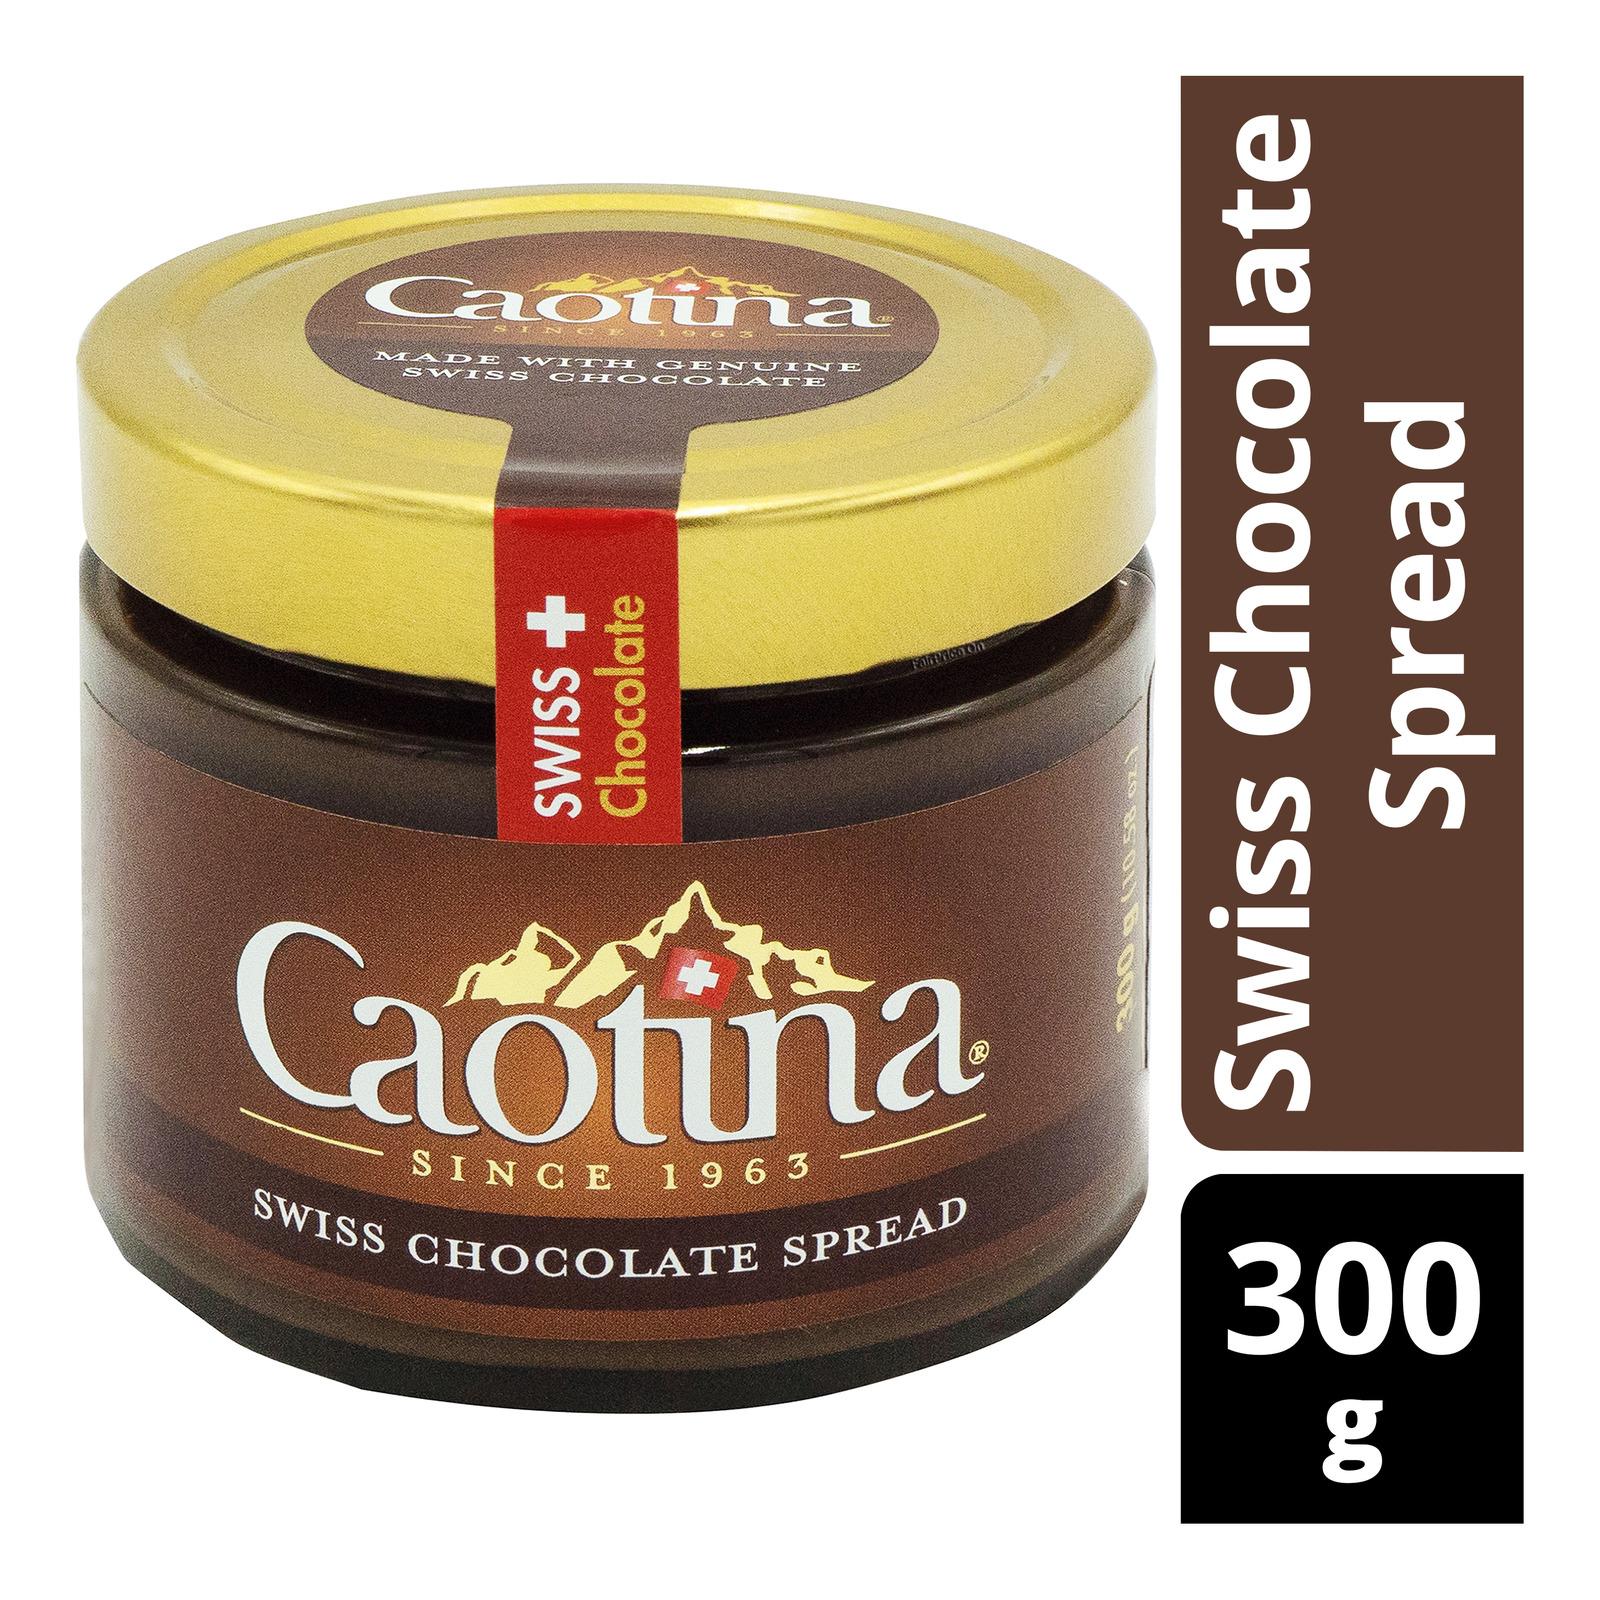 Caotina Swiss Chocolate Spread